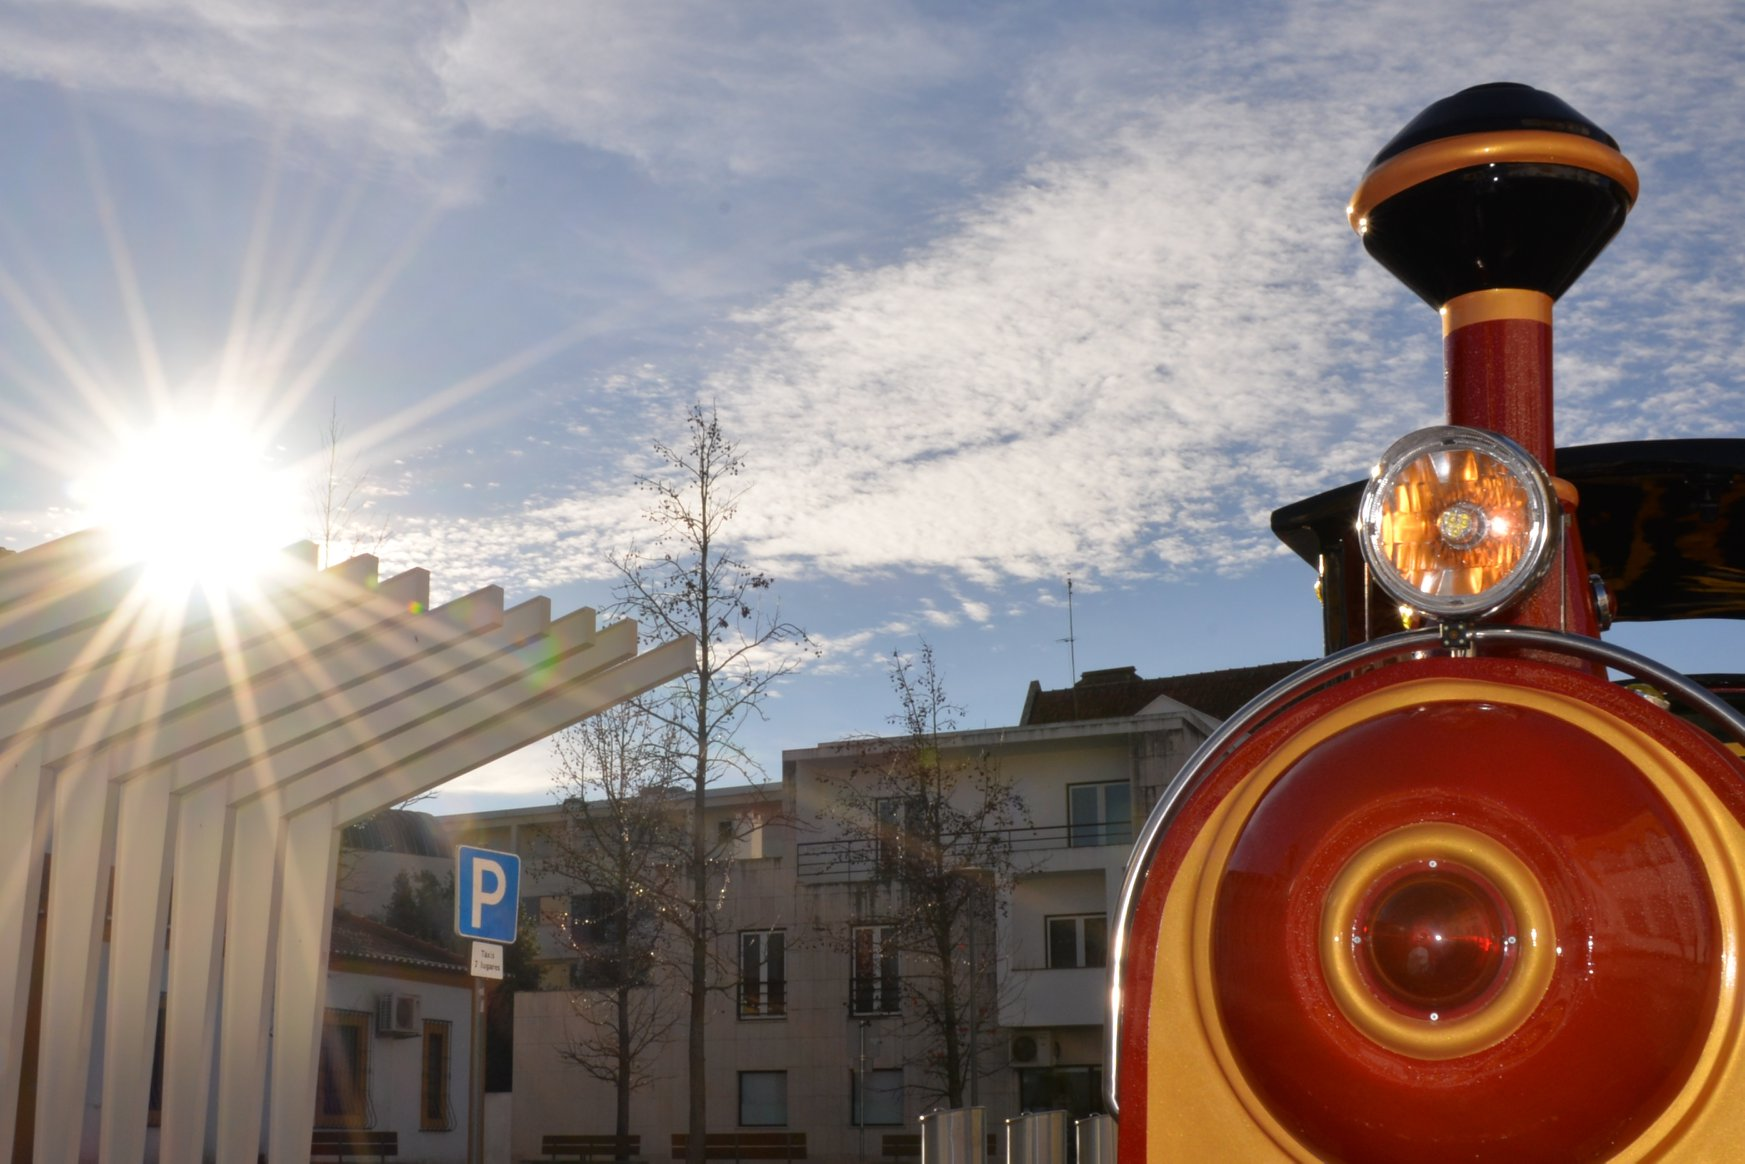 Voz do fado no comboio do Natal Iluminado